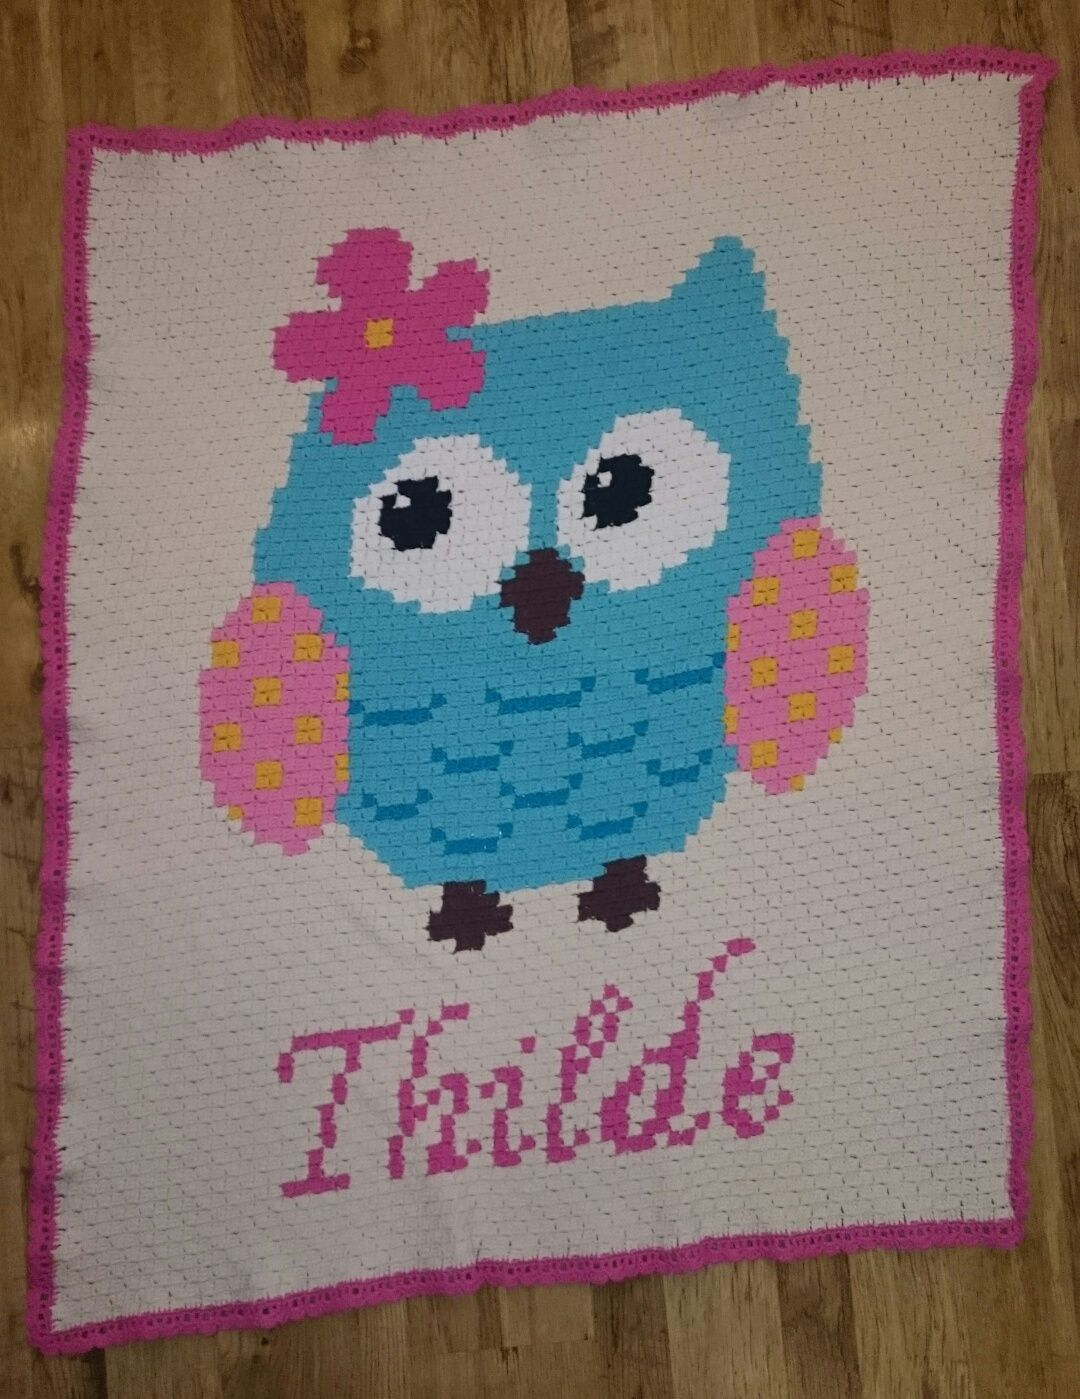 crochet graphgan - Crochet C2C graph blanket C2C crochet pattern ...